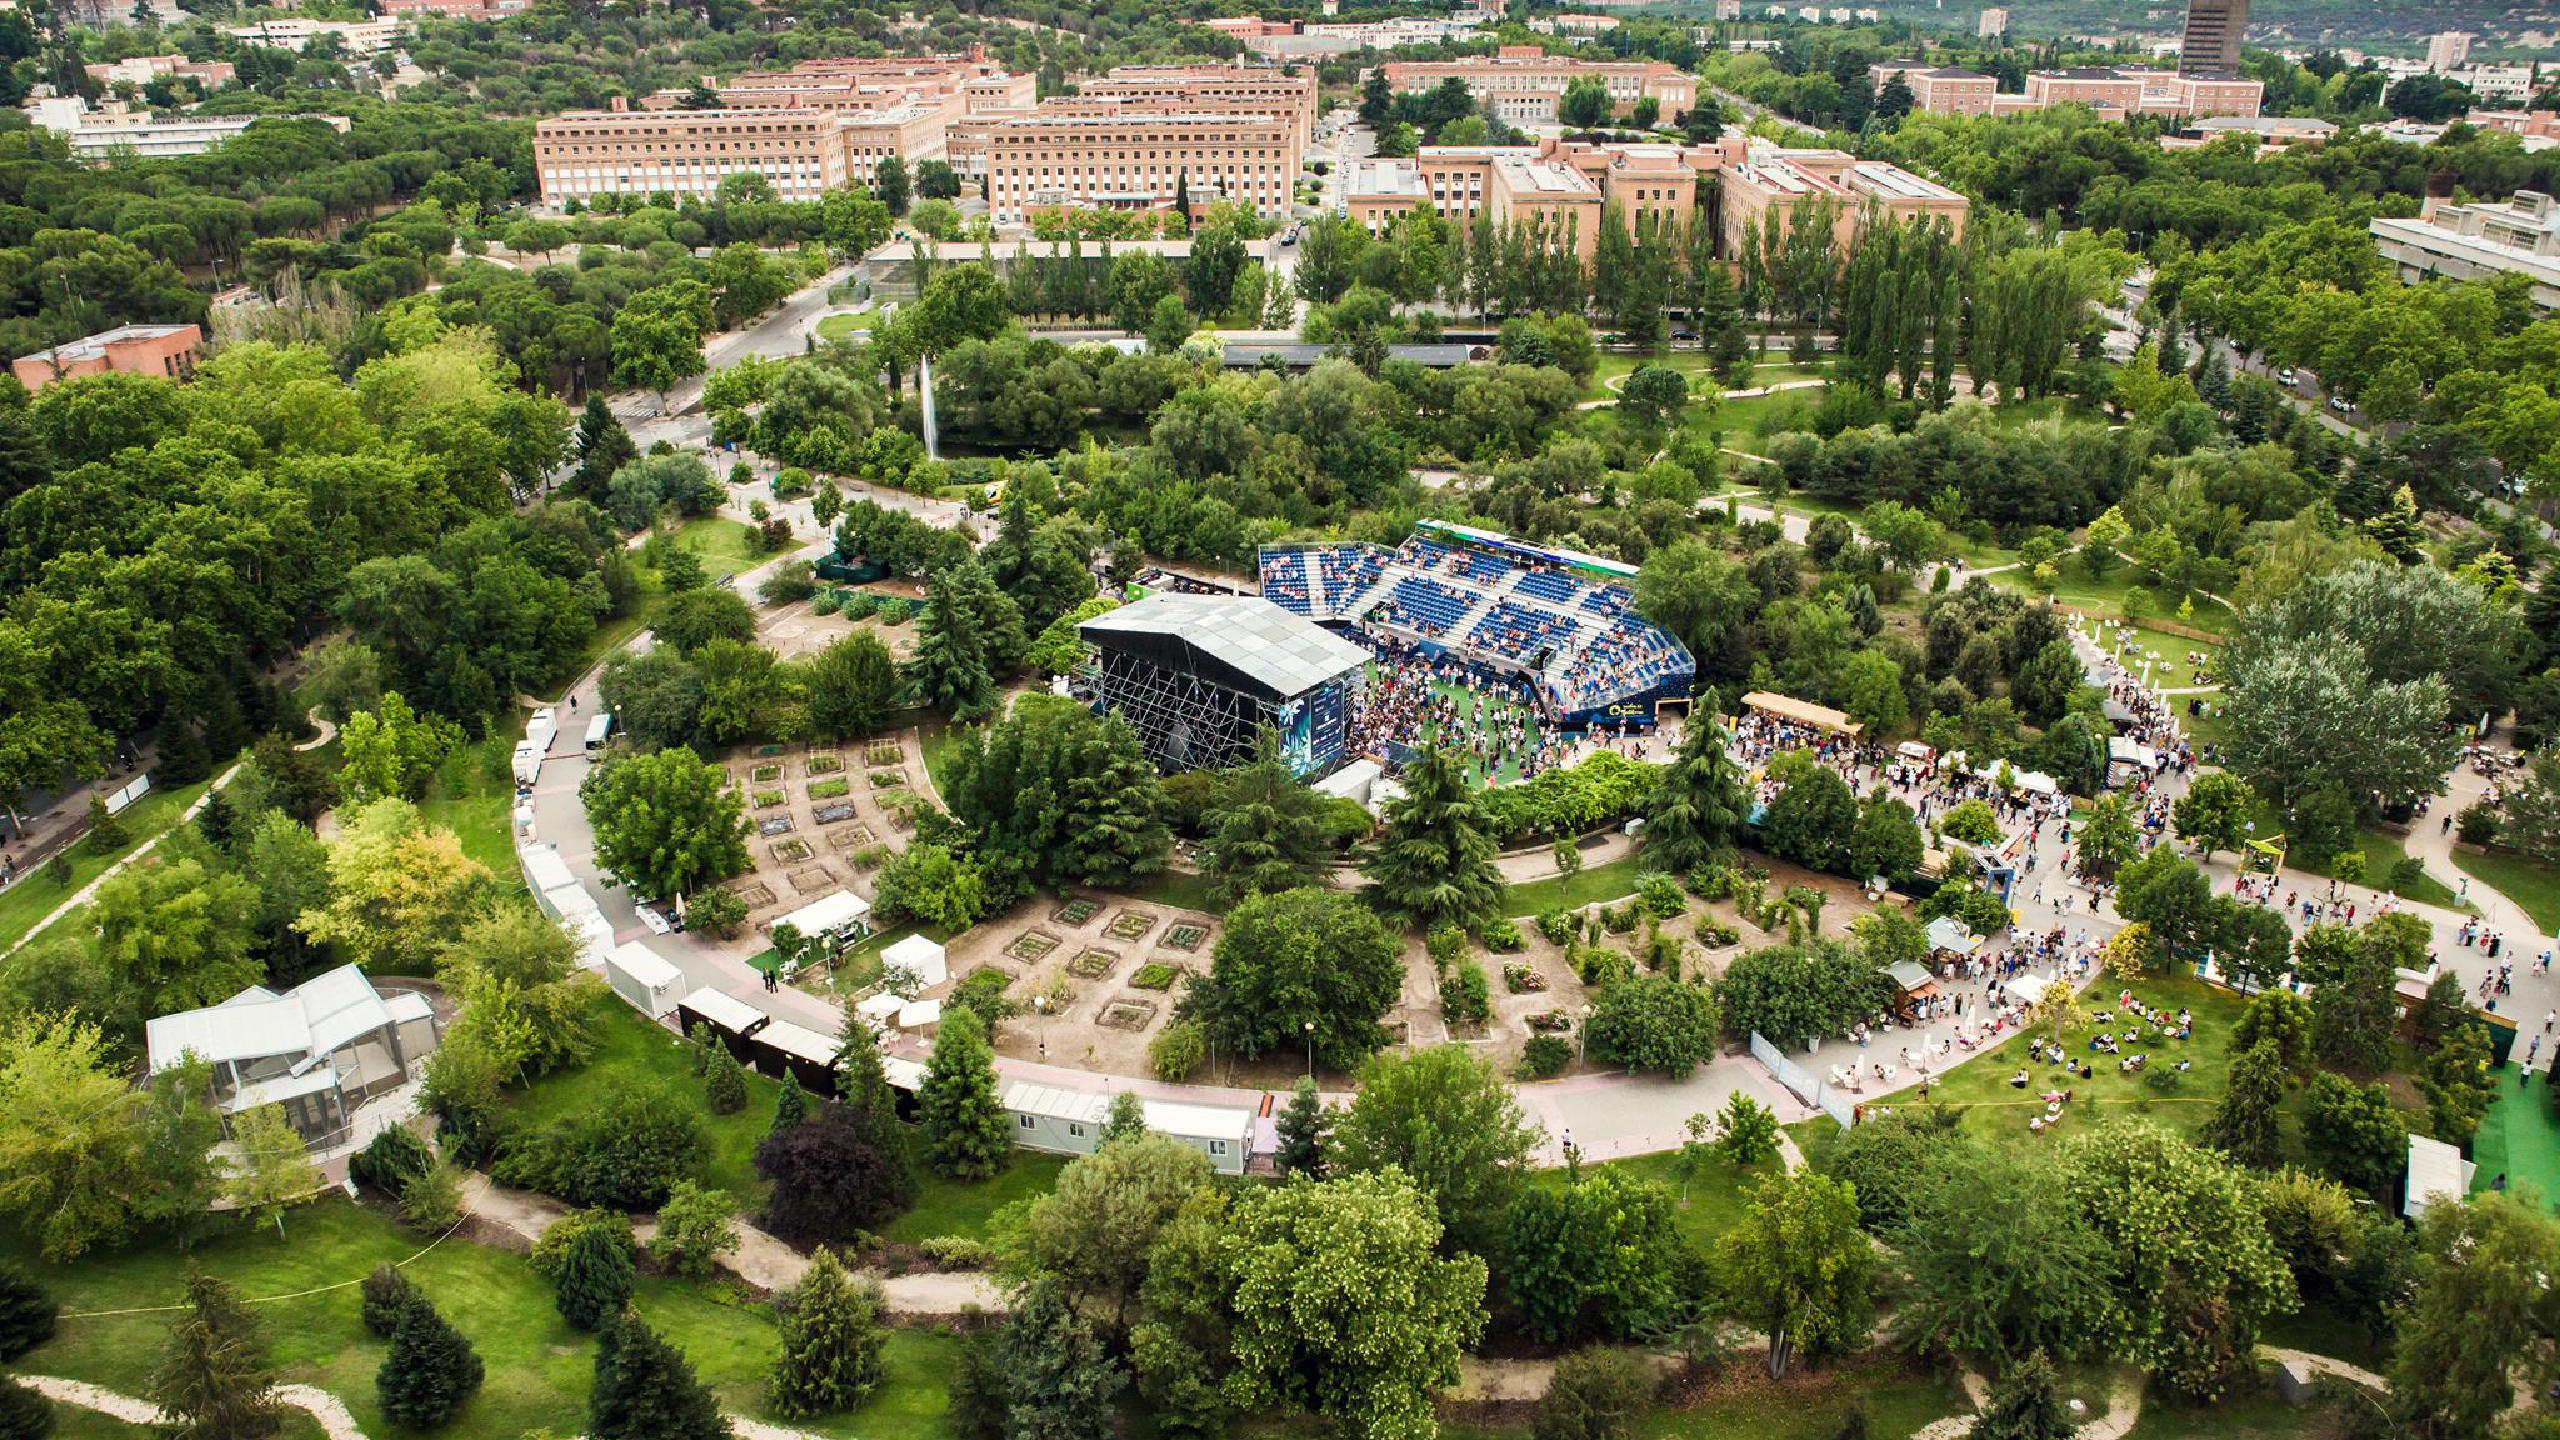 Real Jardín Botánico Alfonso XIII, Madrid